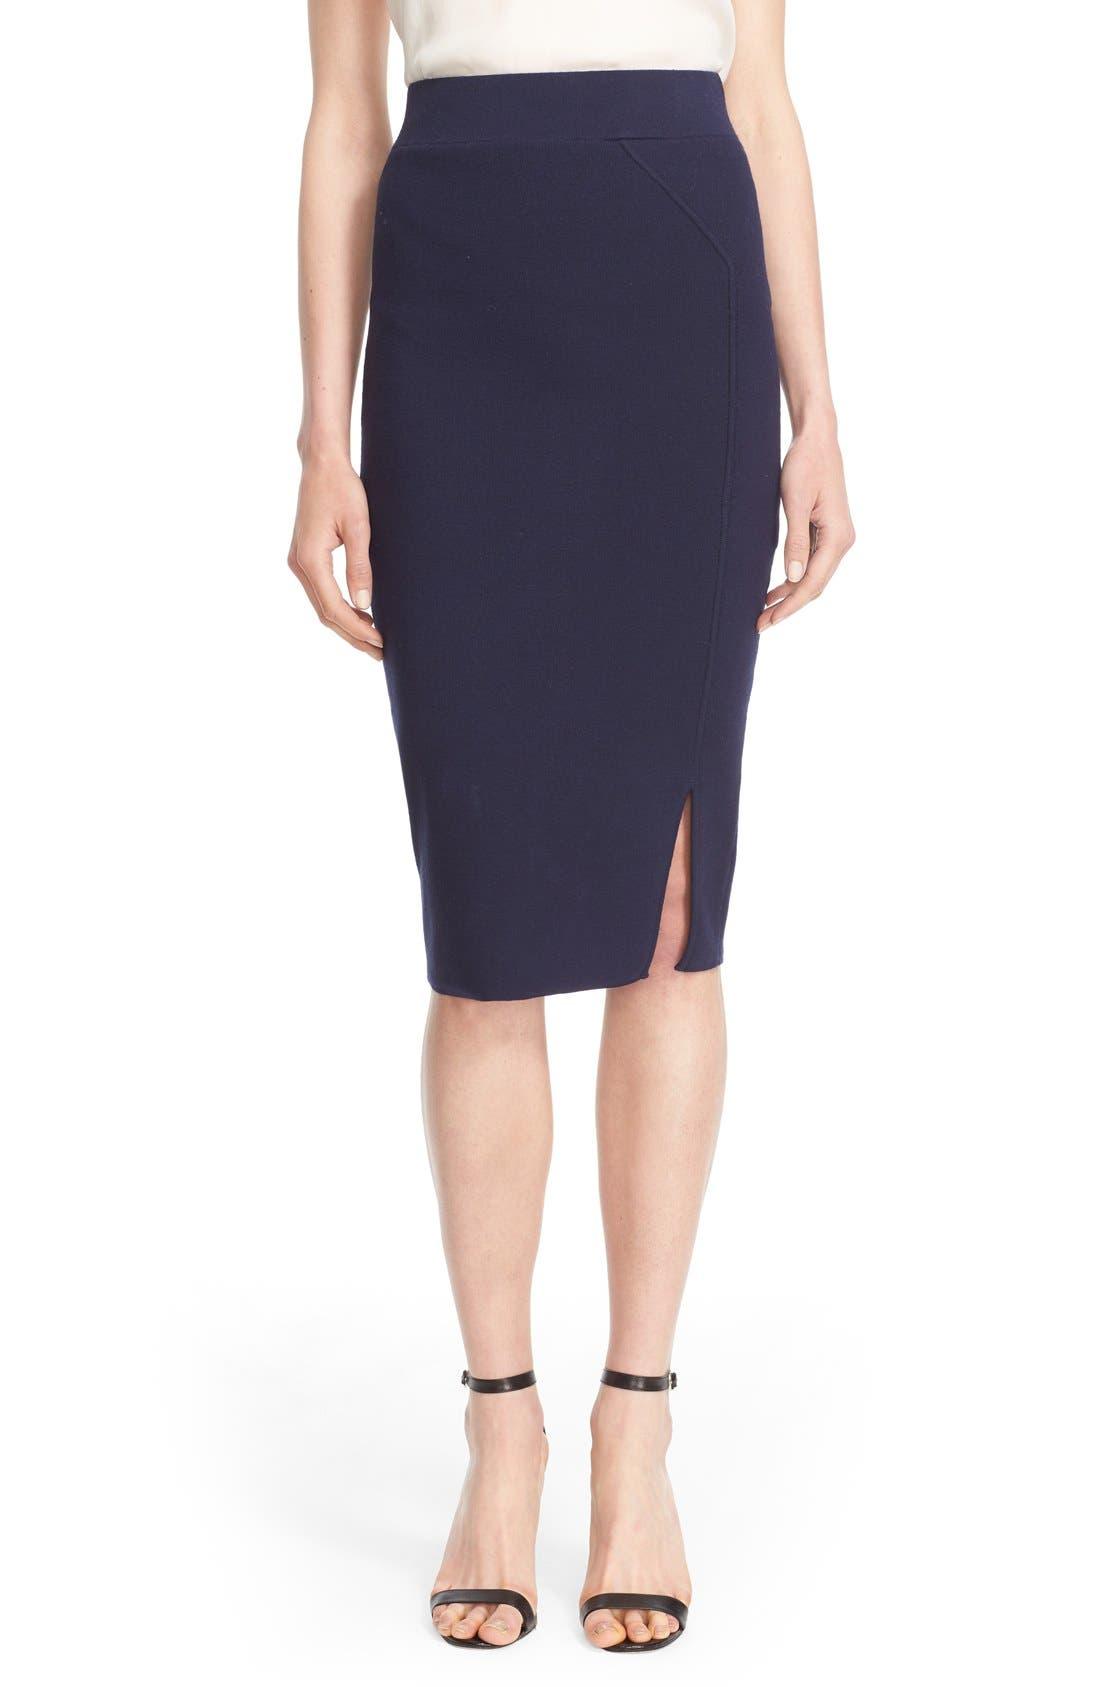 Alternate Image 1 Selected - Milly Structured Side Slit Skirt